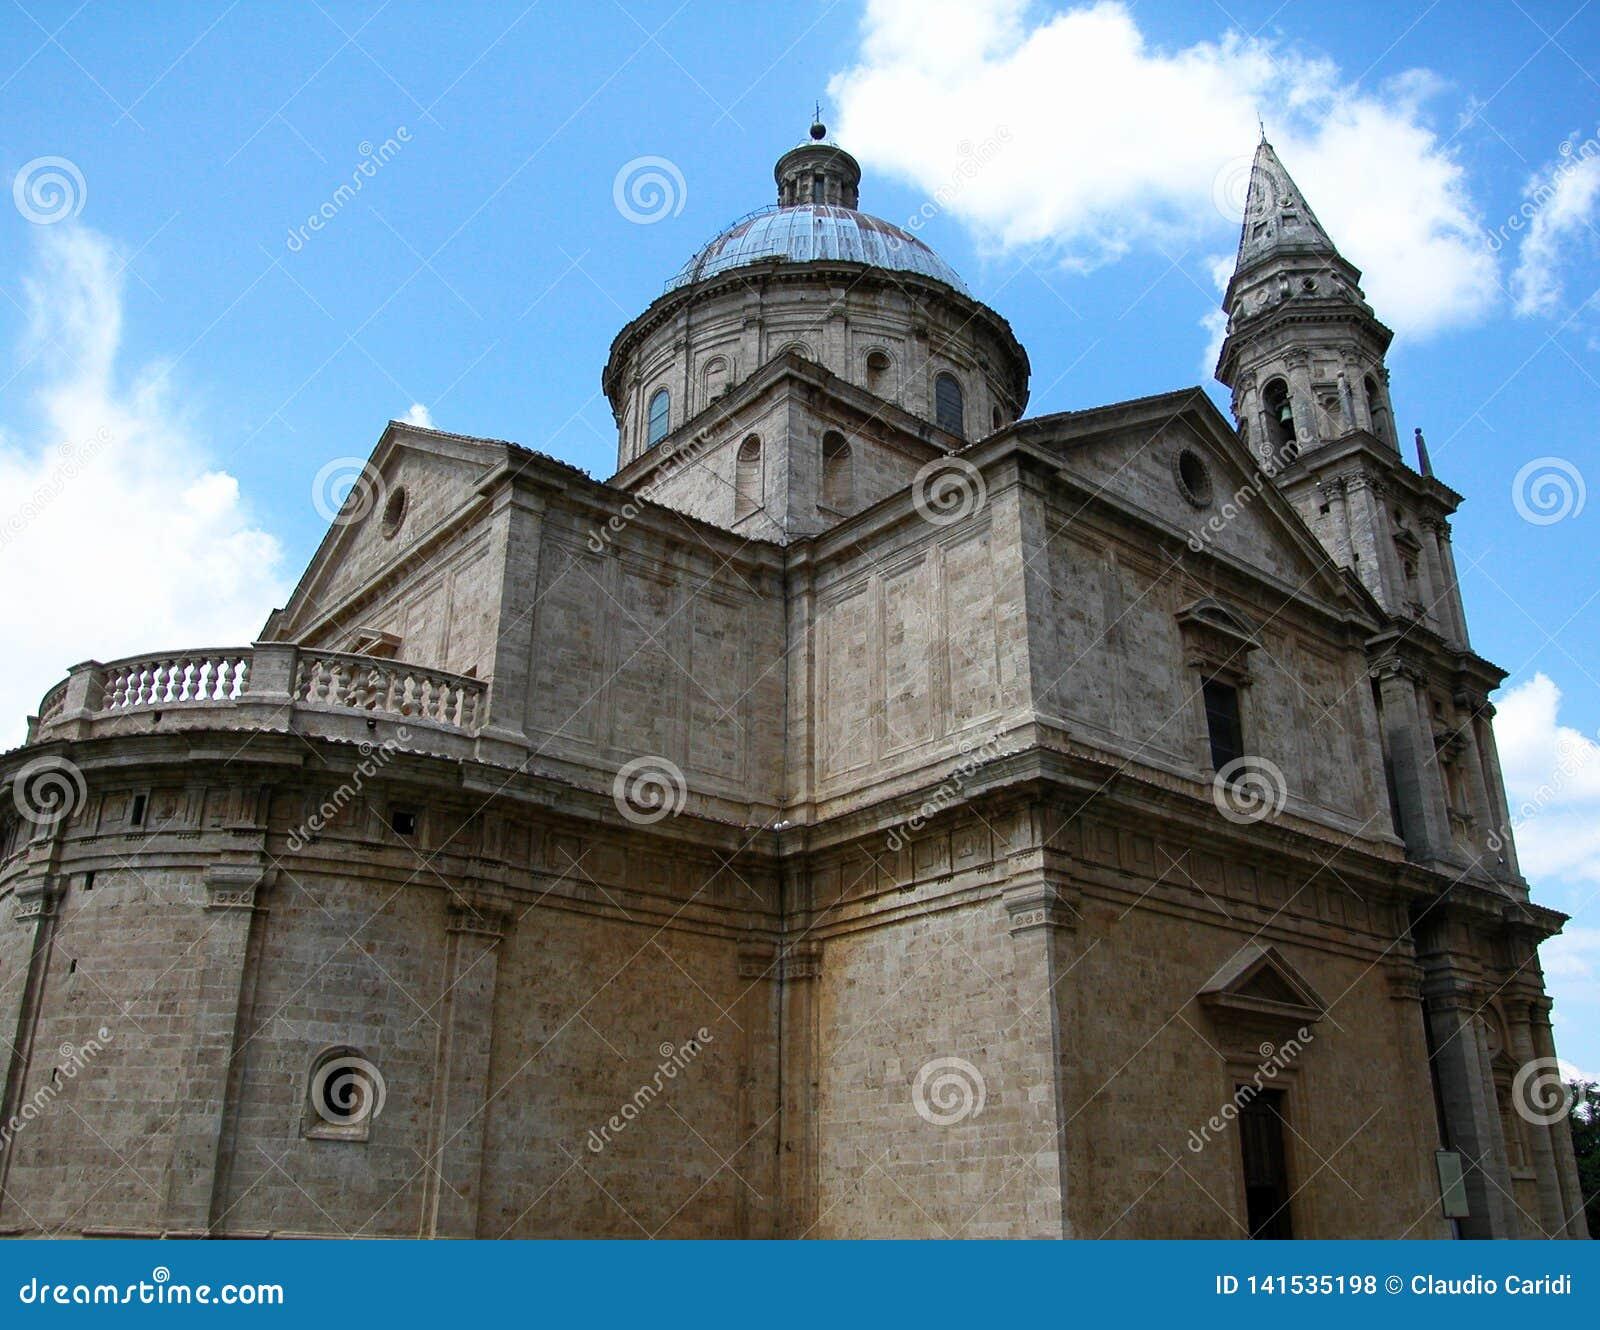 Basilica of Madonna di San Biagio in Montepulciano, Tuscany, Italy